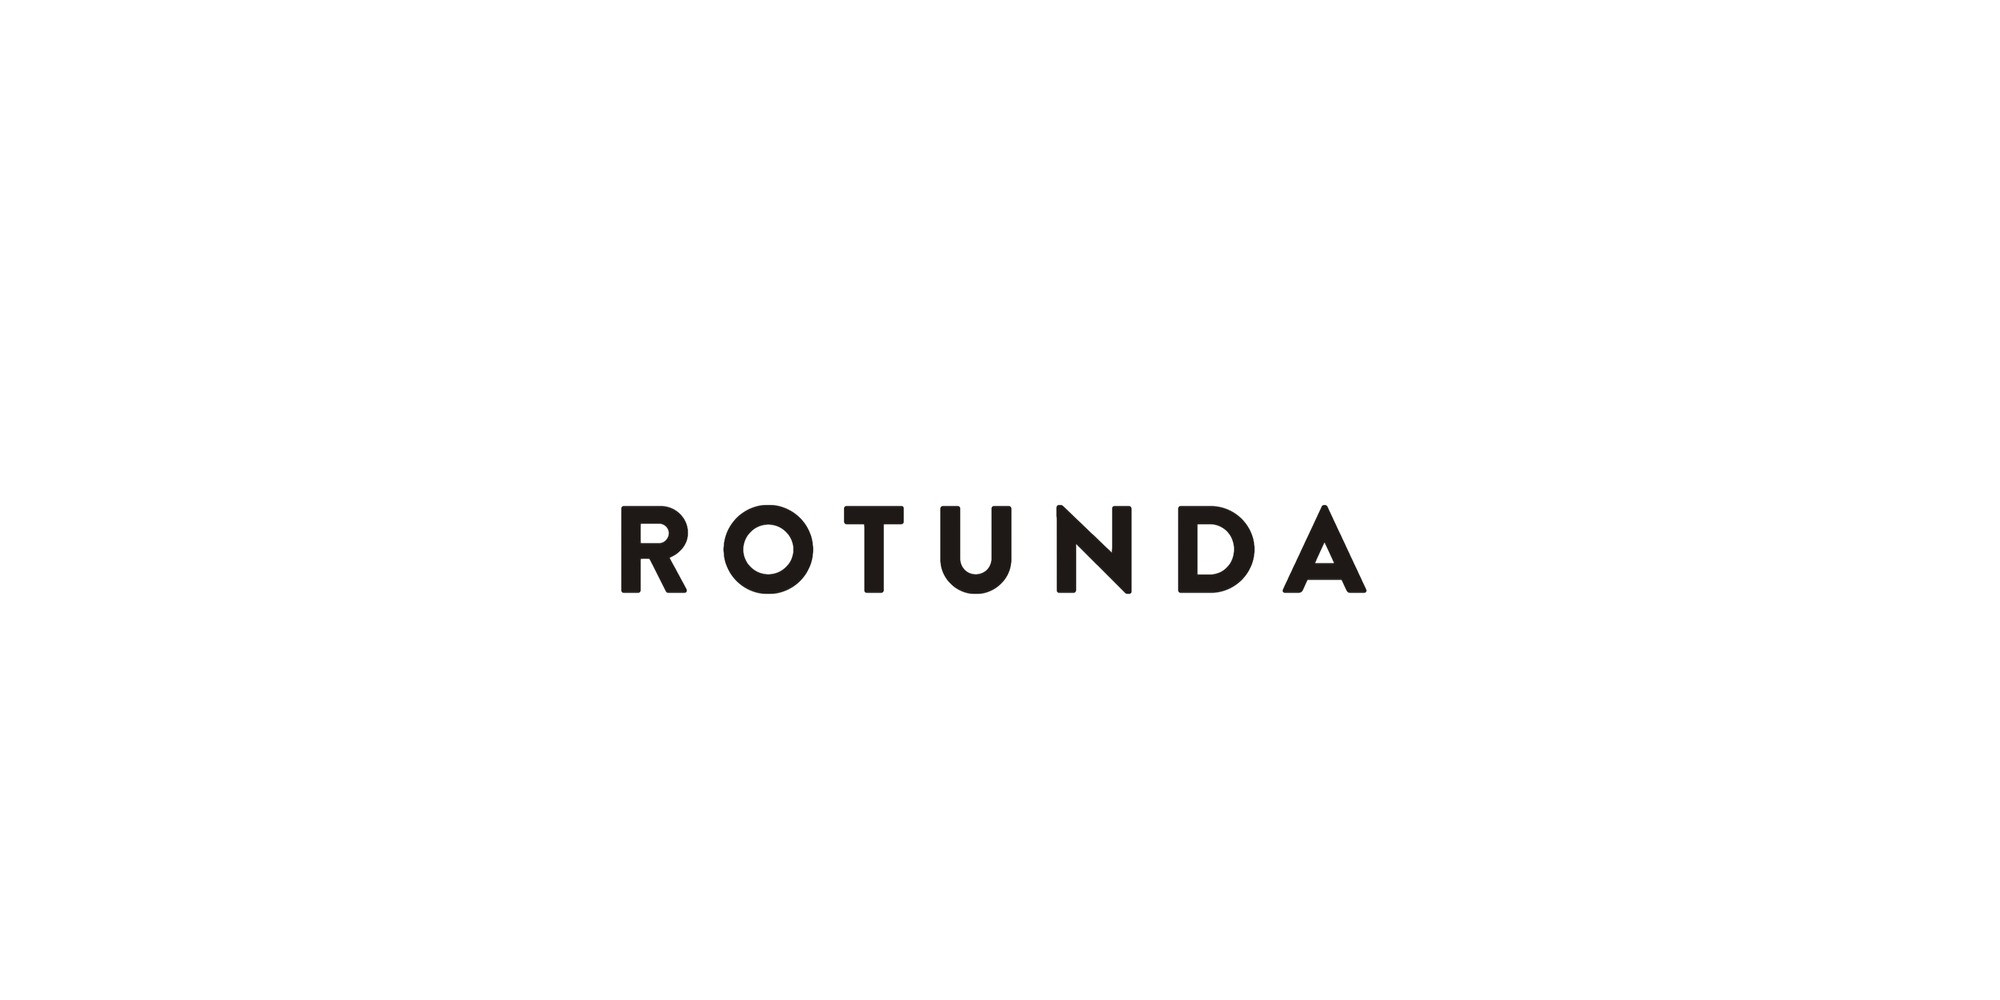 Cuarentena Rotunda -  Vale x $3000